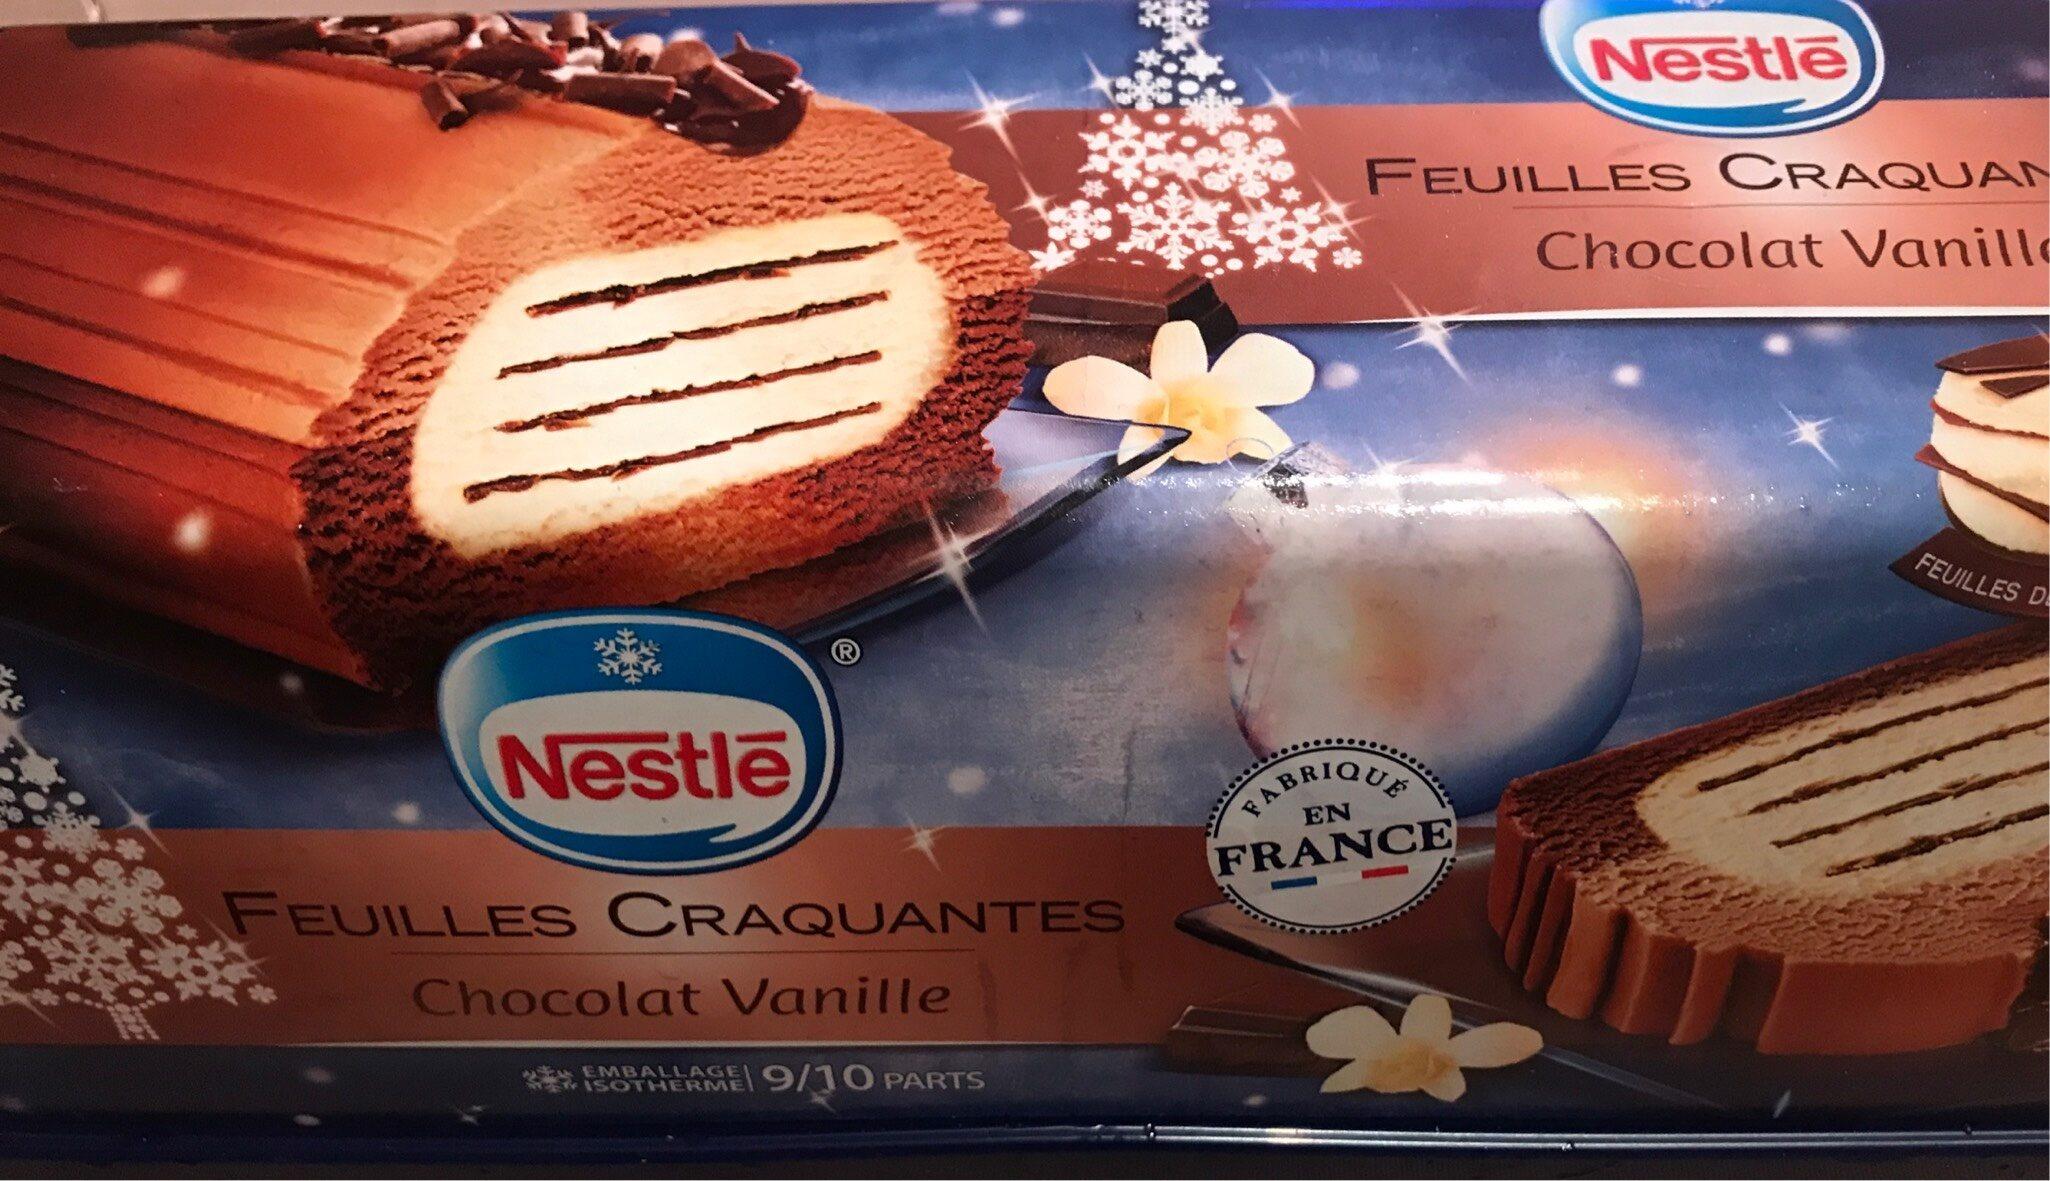 Bûche feuilles craquantes chocolat vanille 1 l - Product - fr